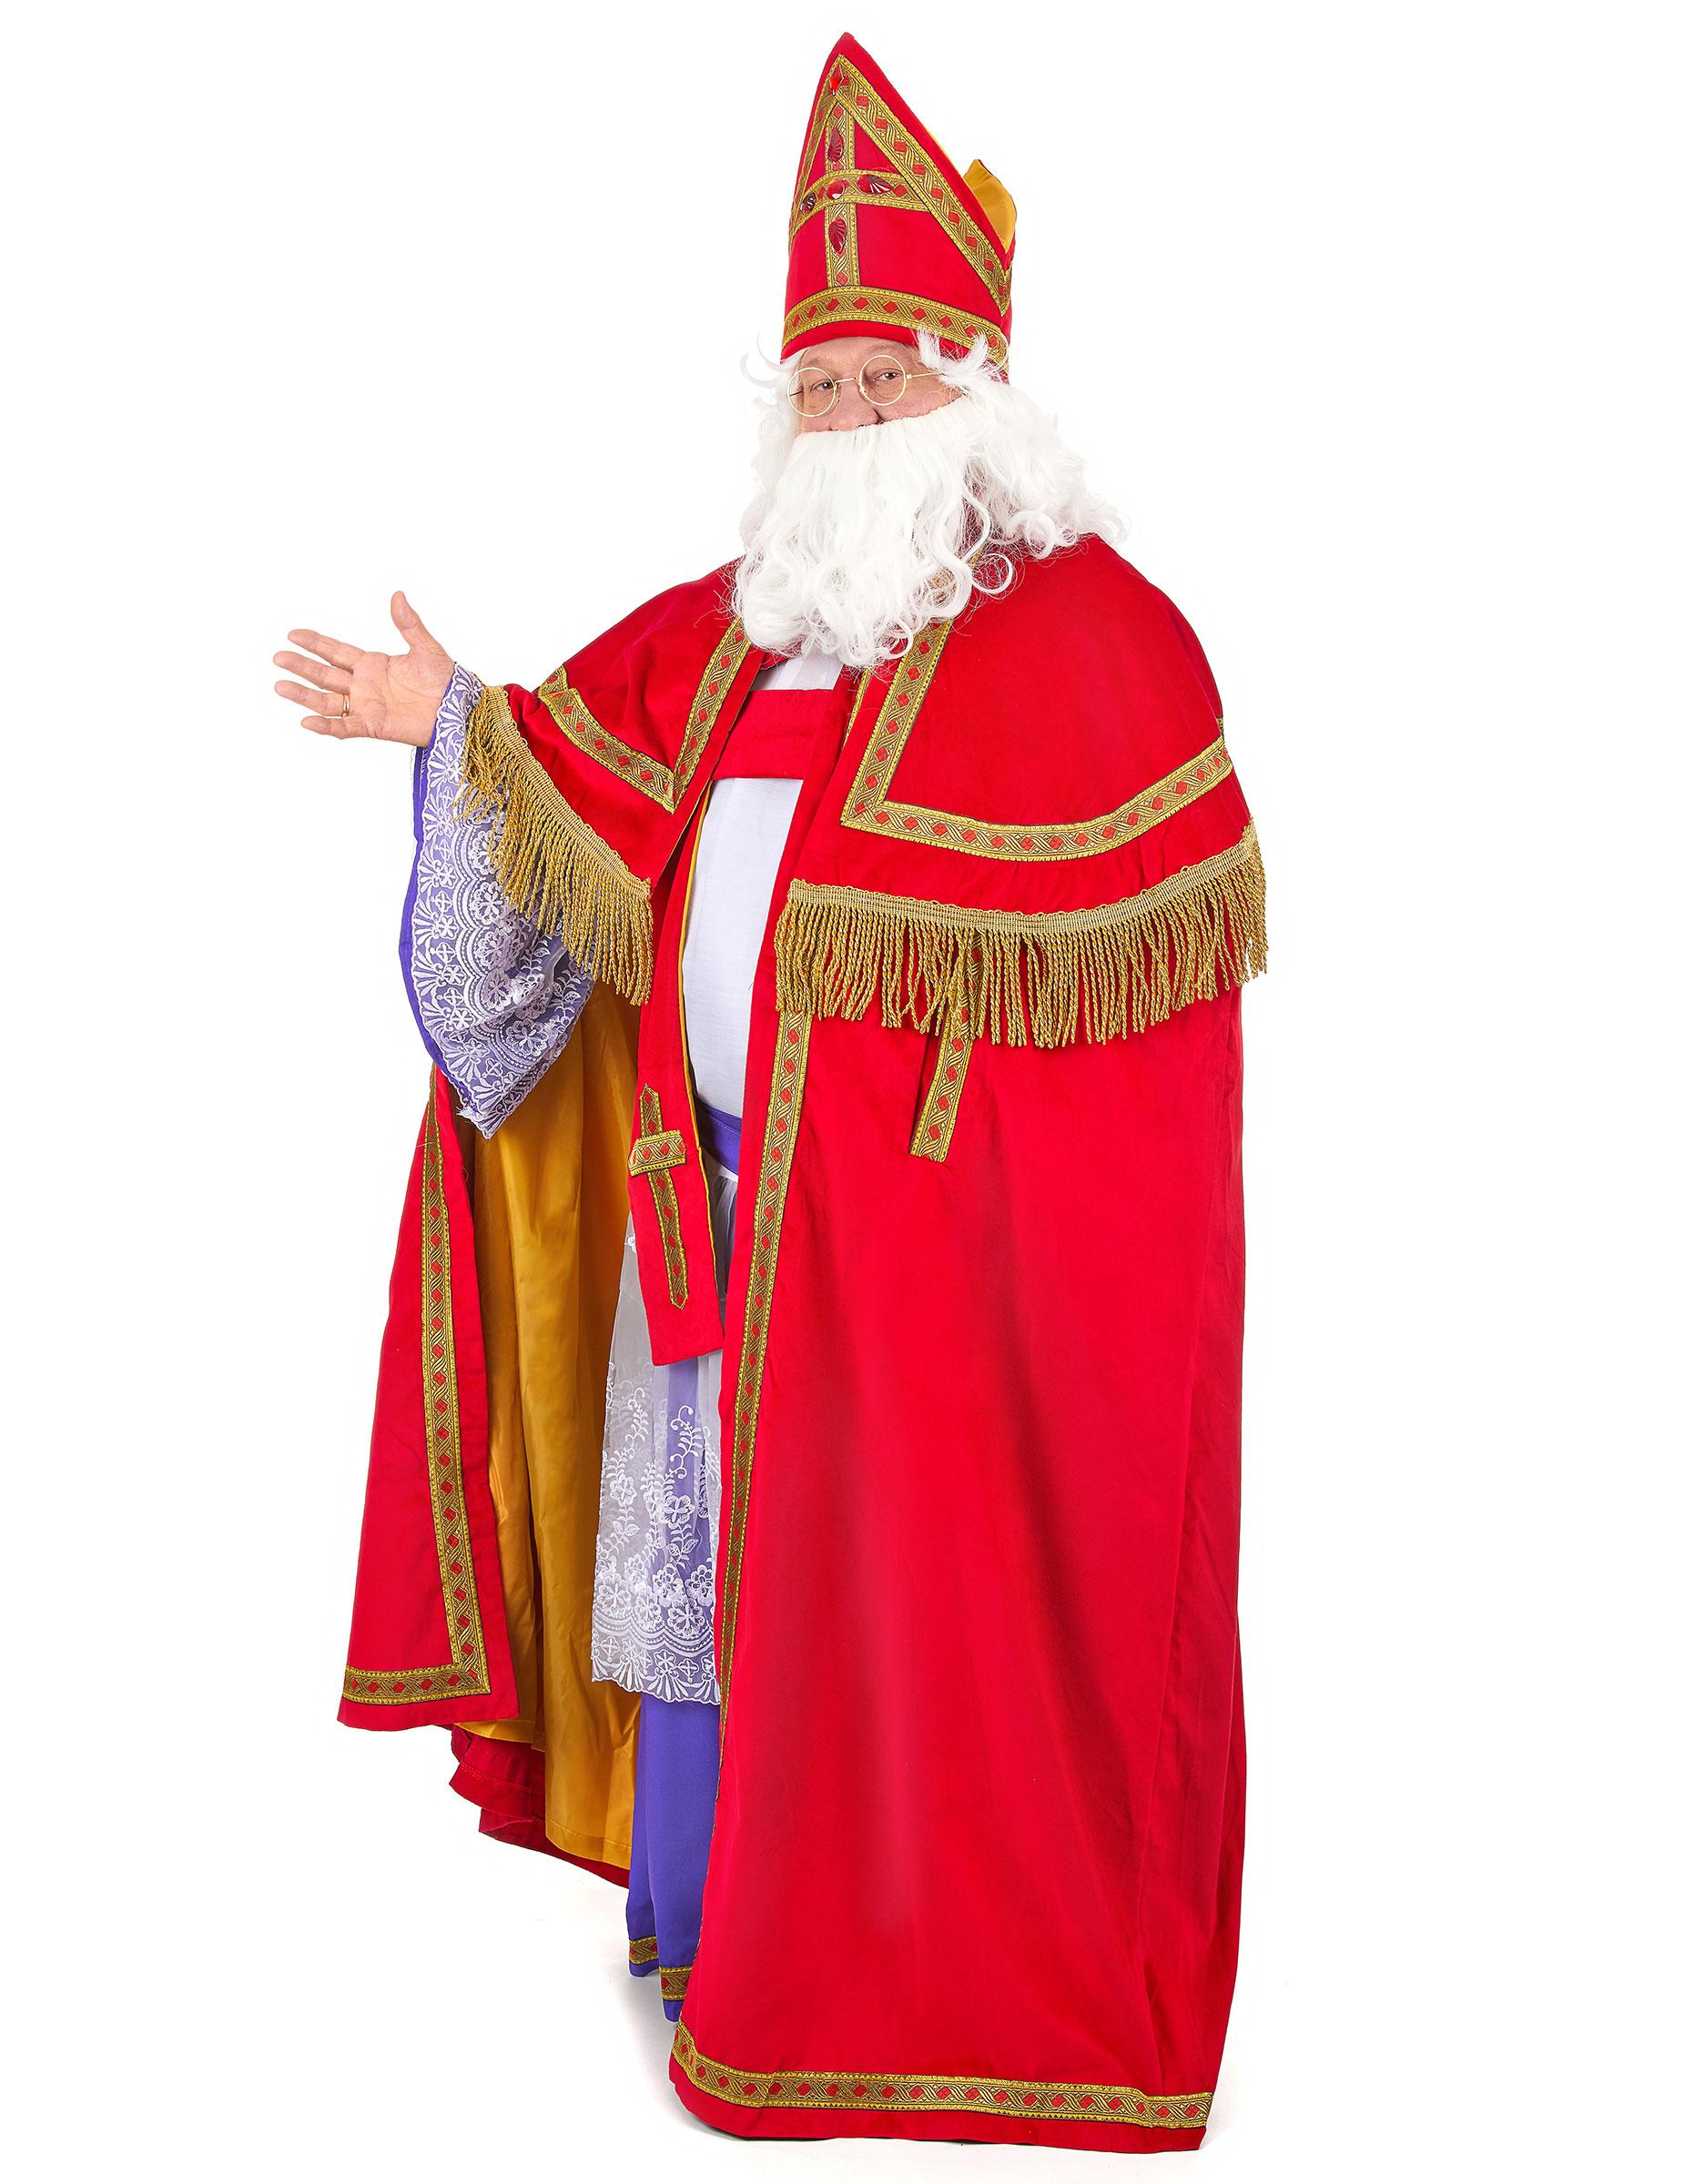 Saint nicolas hommes célibataires